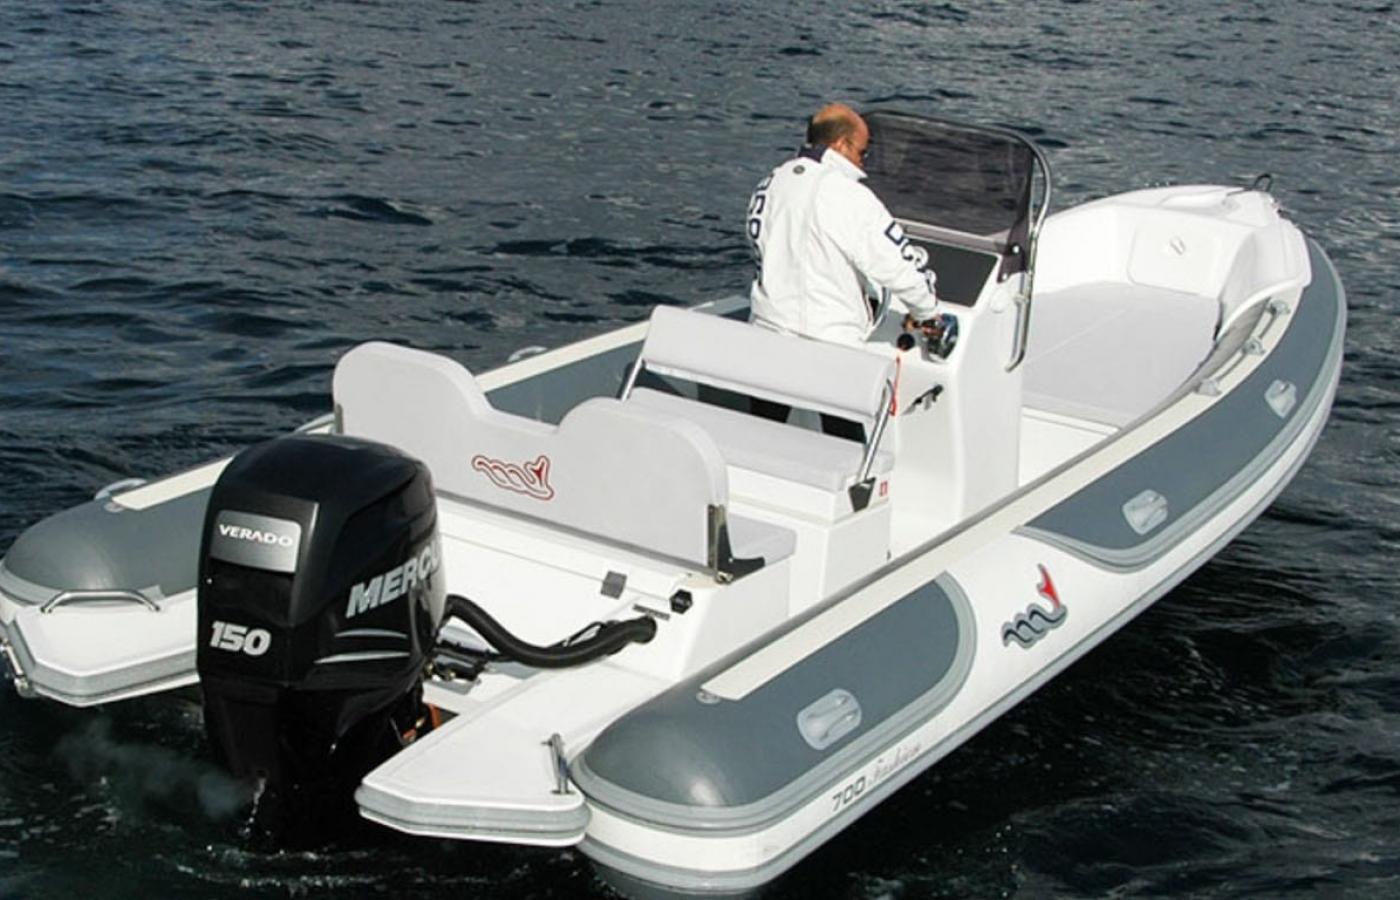 Motonautica MV700 - Perfect Two sailing the Greek islands